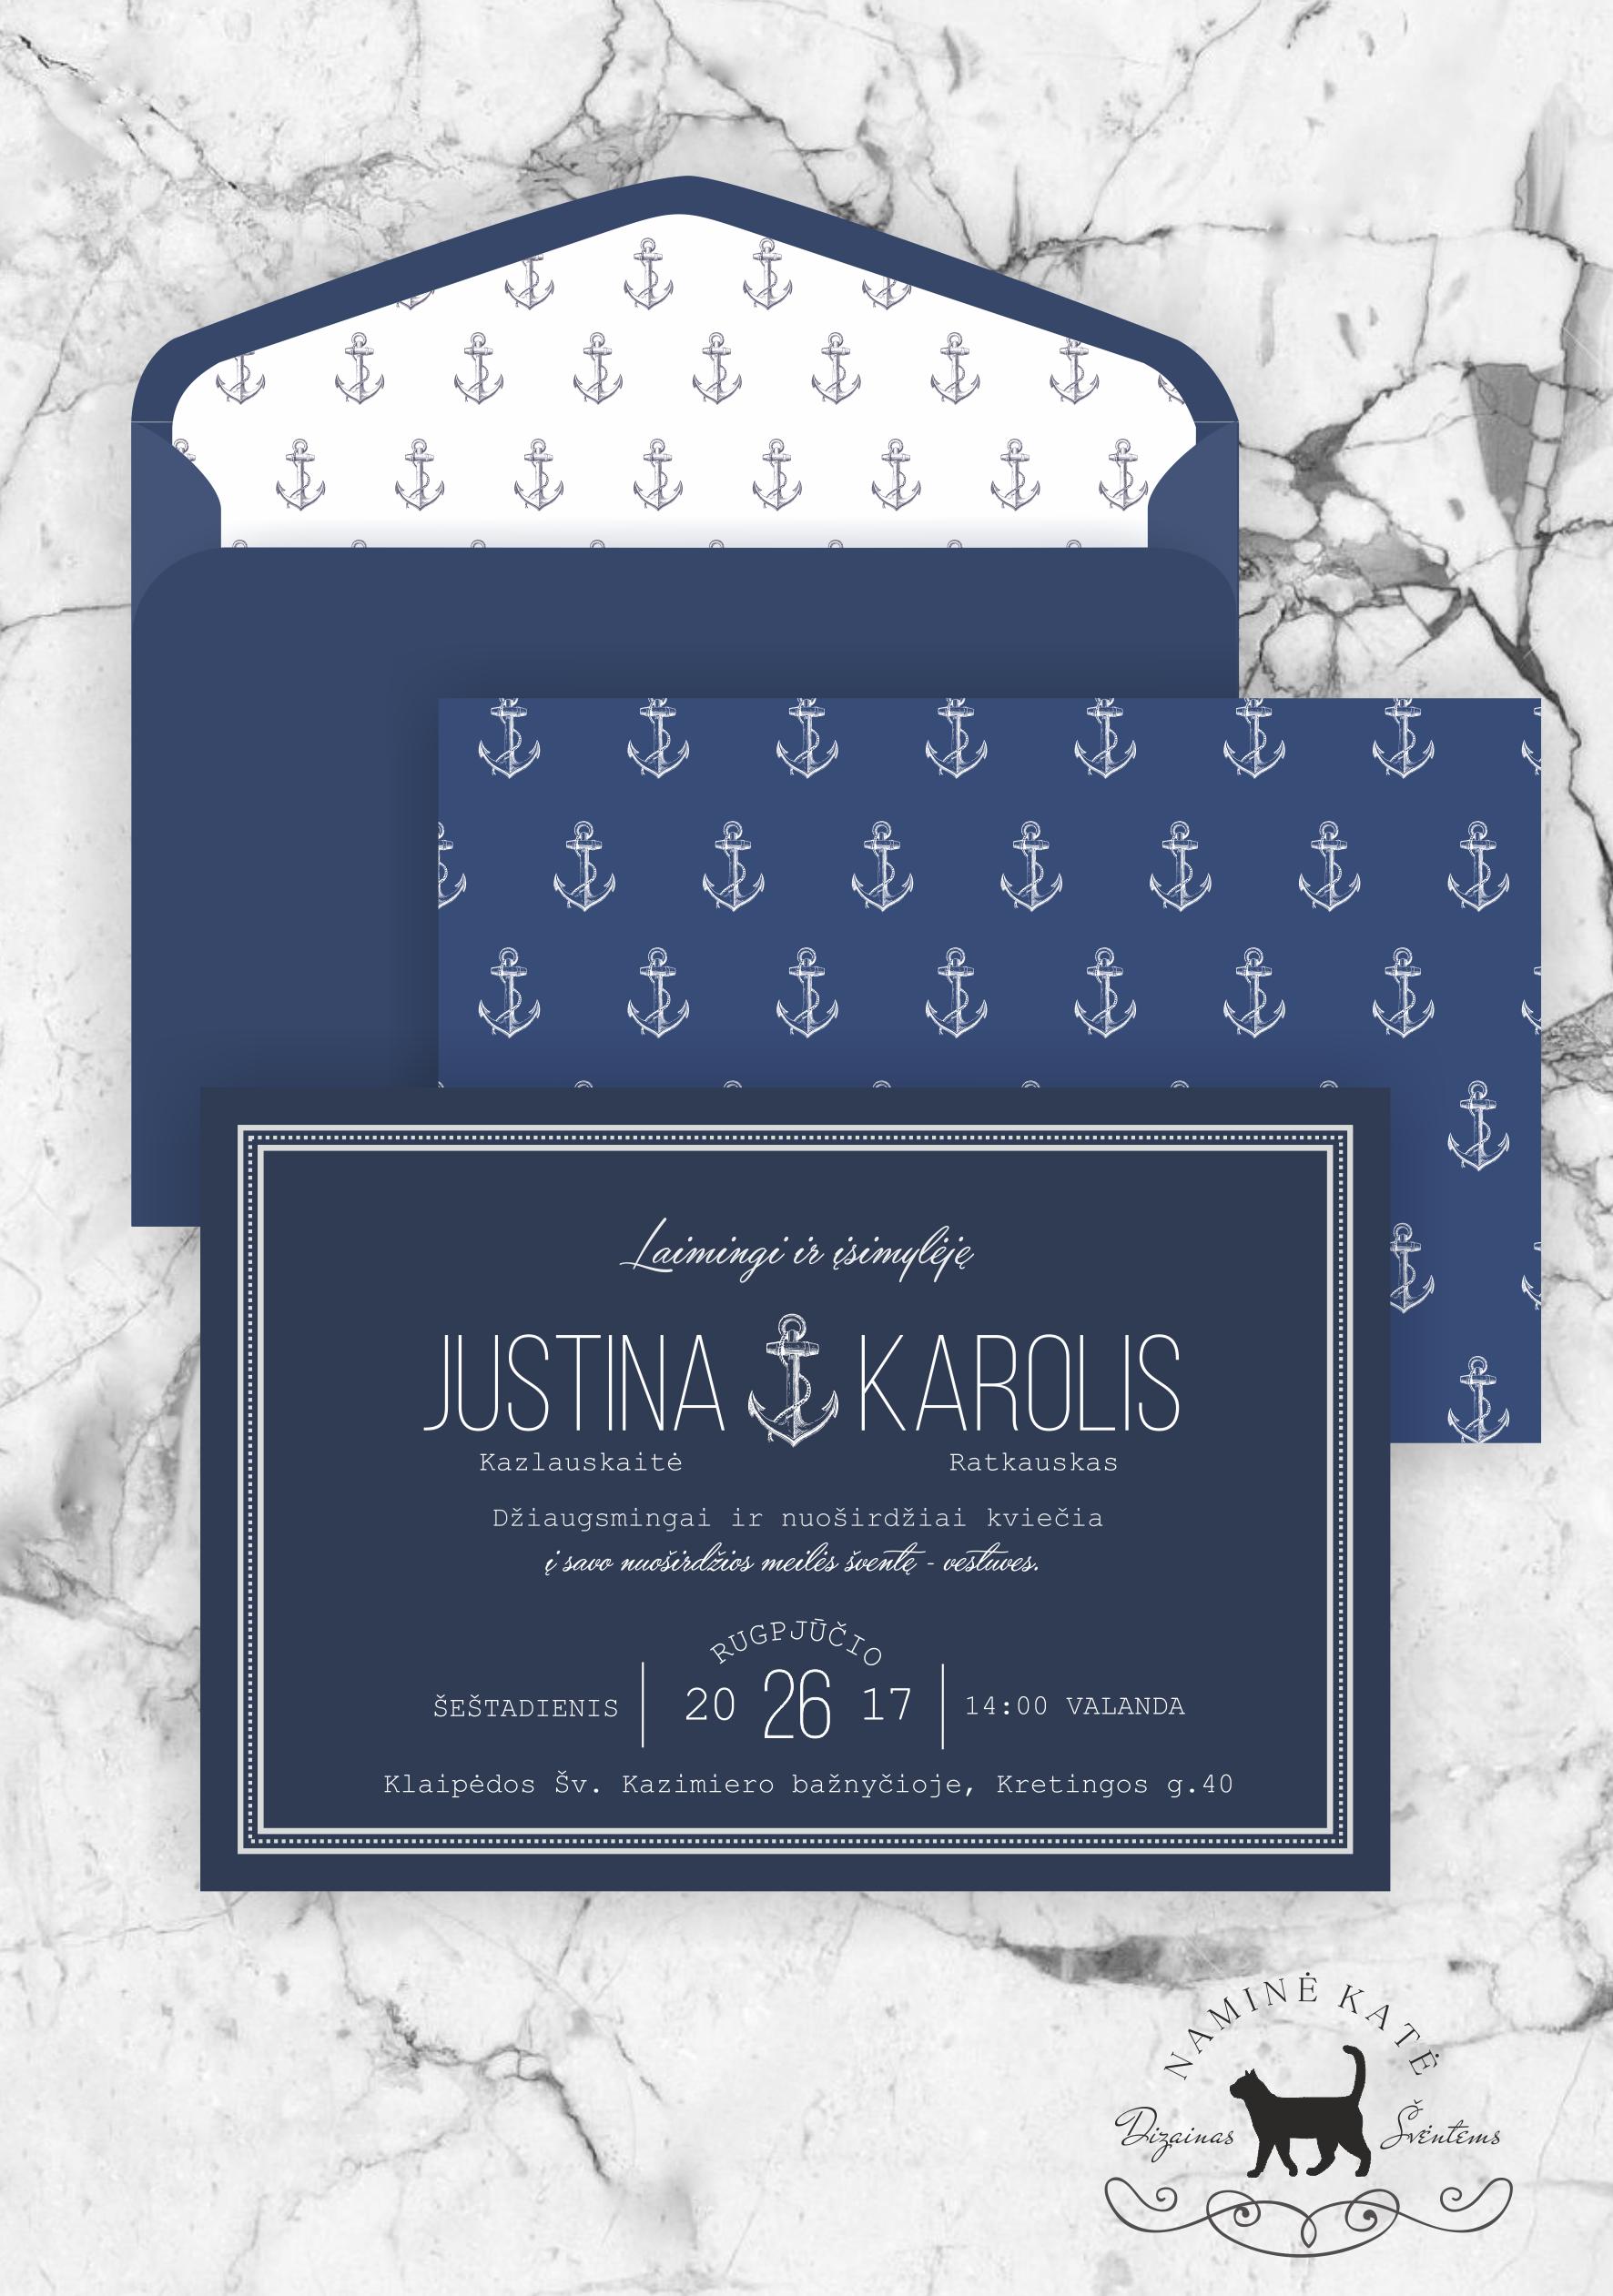 Marinistic Style Invitation Solid, Romantic Invitation For Weddings On The